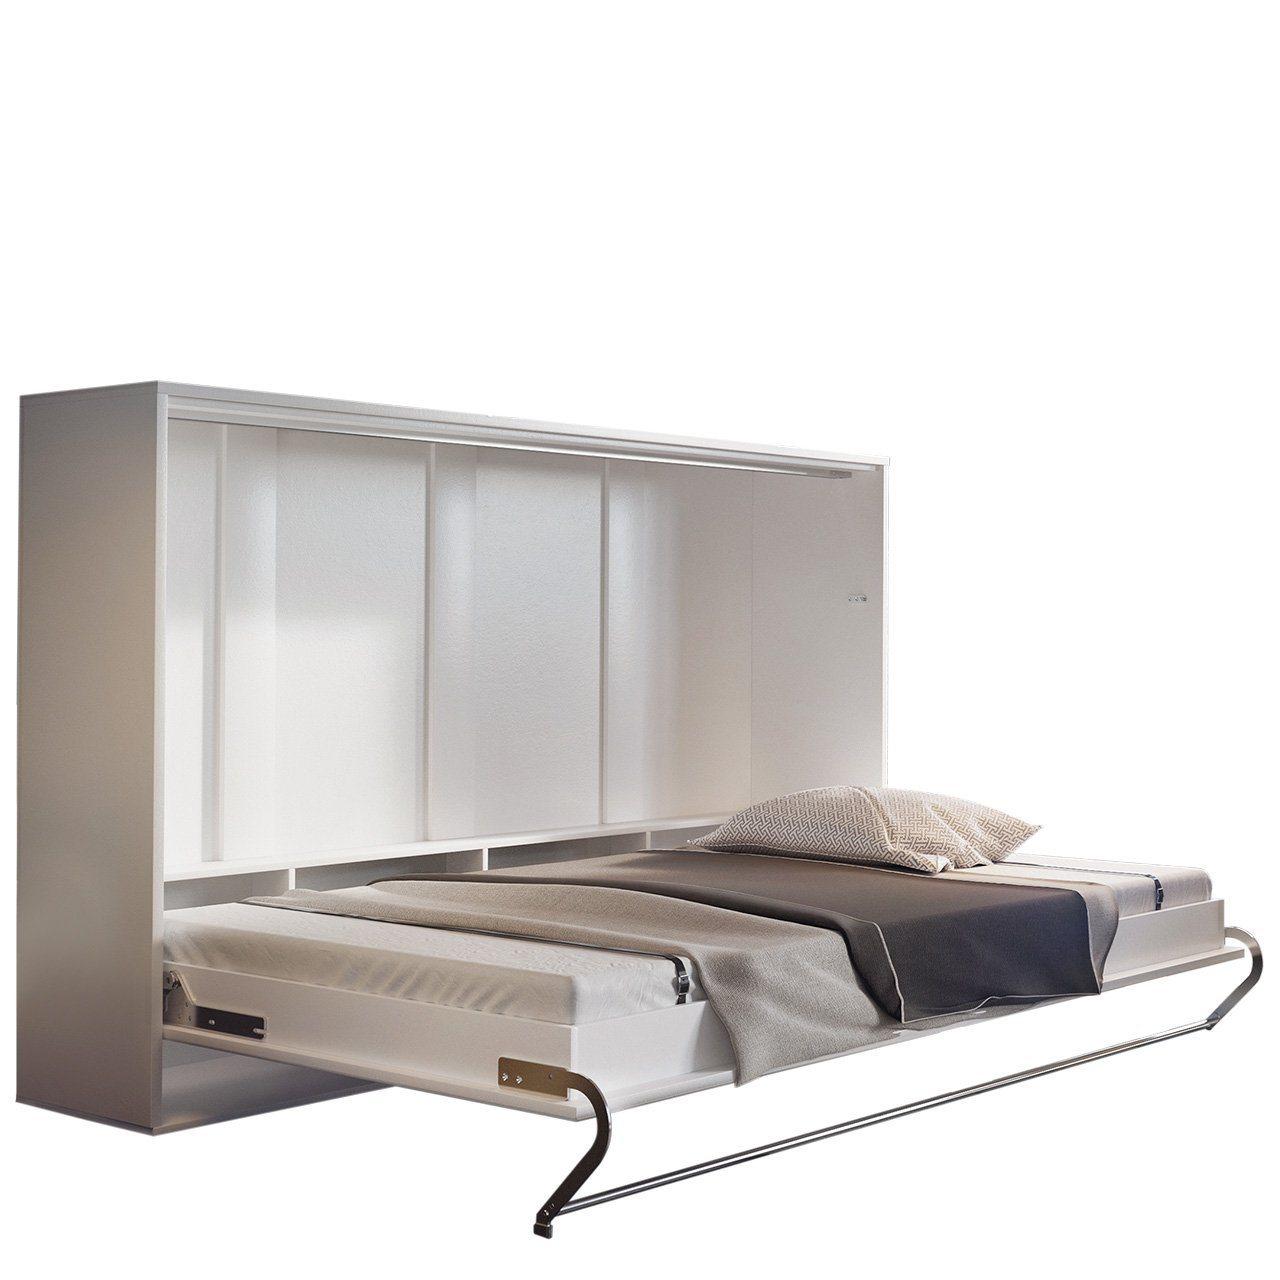 Full Size of Bett Schrank Schrankbett 180x200 Nehl Kombination Ikea Vertikal Apartment Schrankwand Kombi Test Vergleich Im Februar 2020 Top 6 Einfaches Hängeschrank Küche Bett Bett Schrank